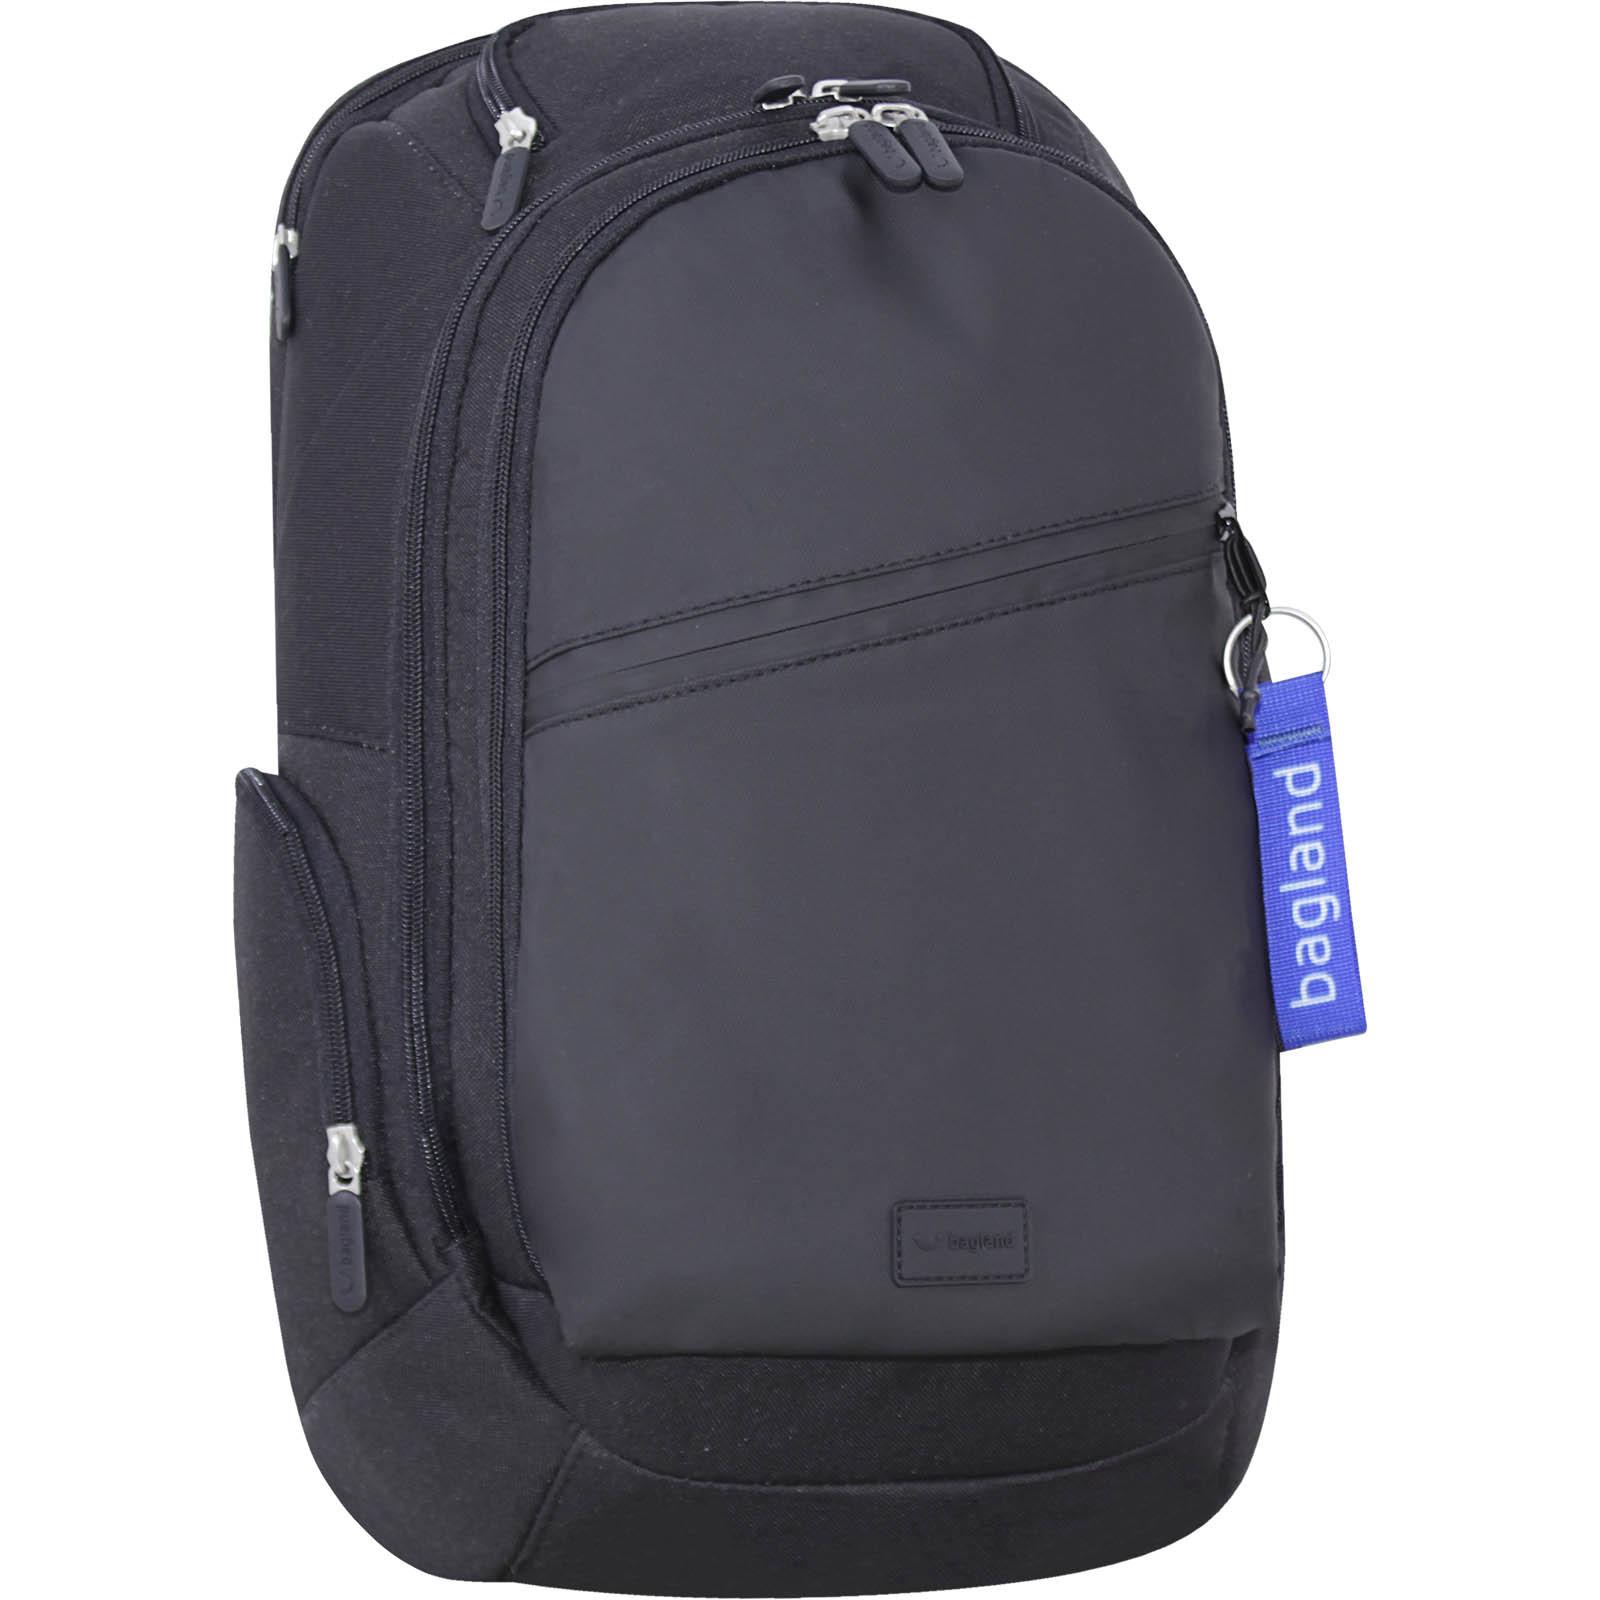 Рюкзаки для ноутбука Рюкзак для ноутбука Bagland Tibo 23 л. Чёрный/кожзам (0019066) IMG_7534-1600.jpg